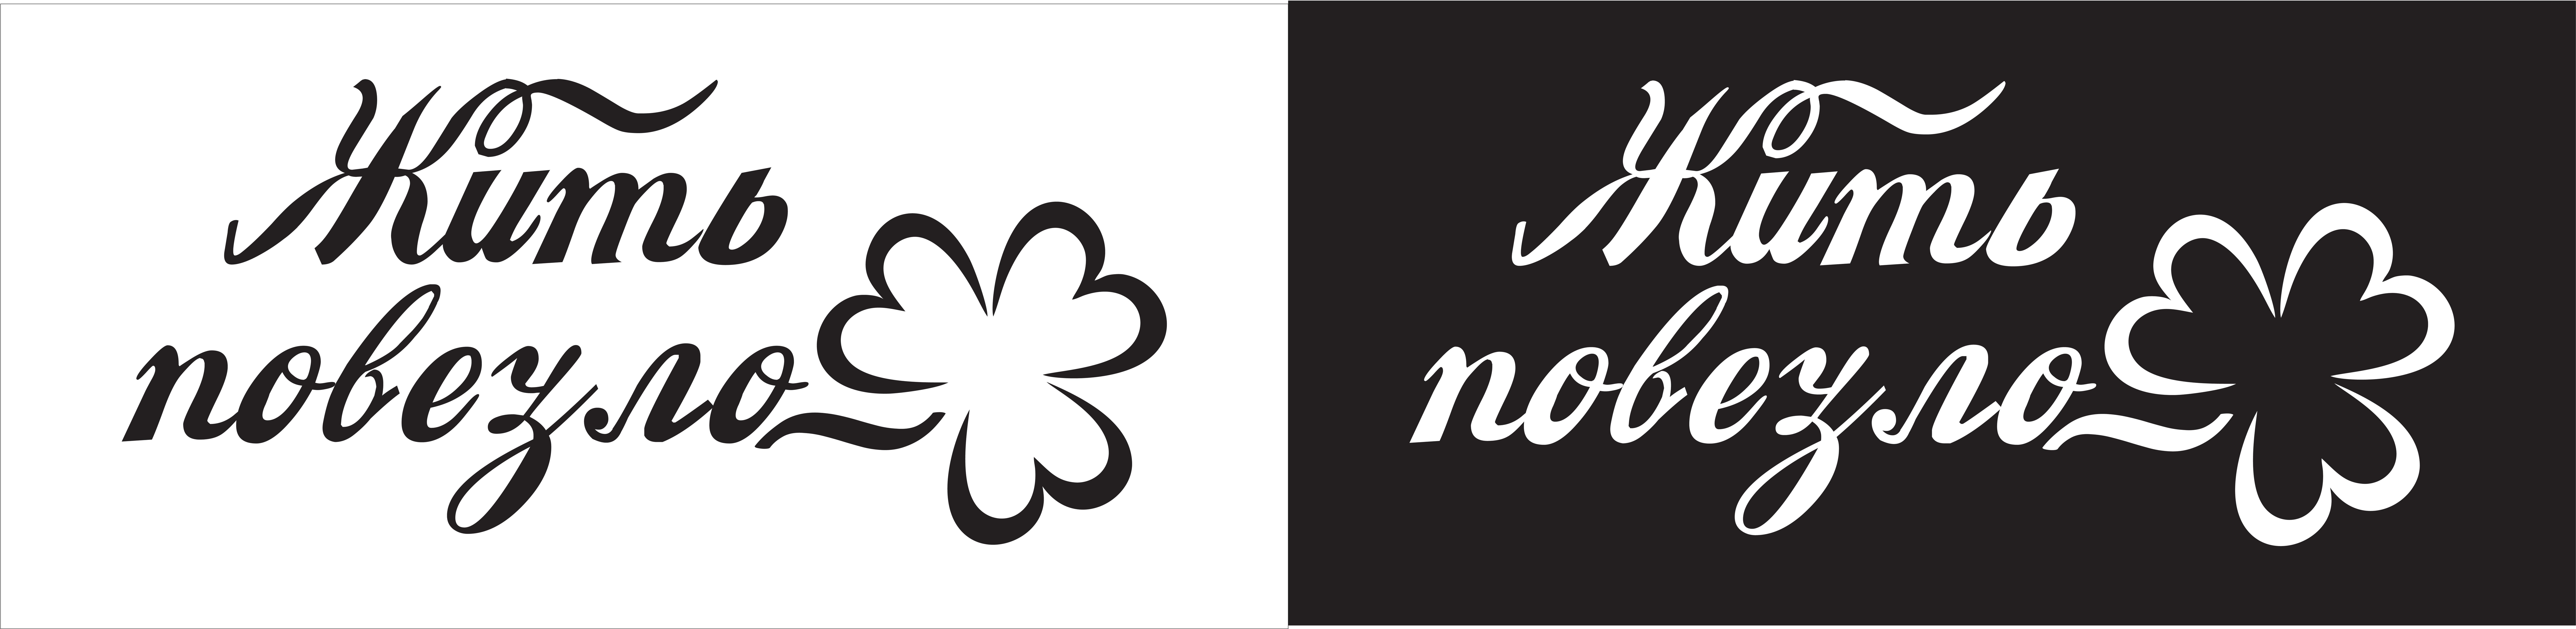 Логотип и фирменный стиль фото f_5405bc0c01068087.jpg